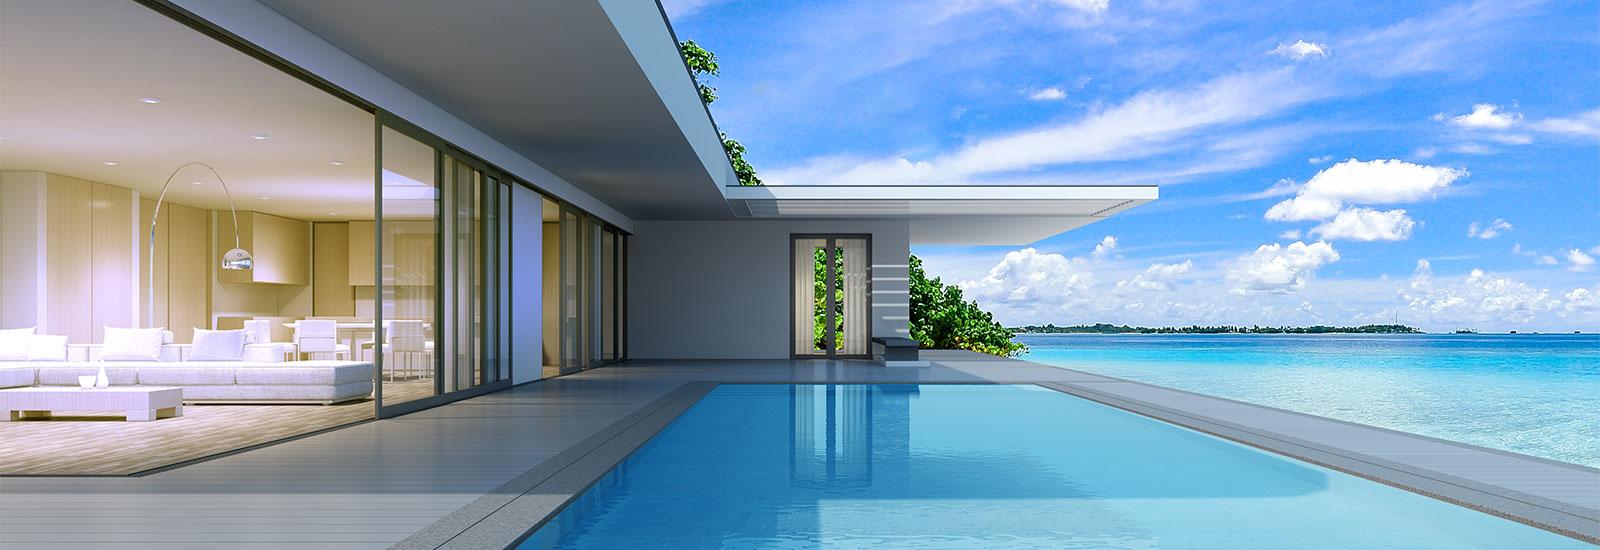 CW Group - Inmobiliario Playa del Carmen